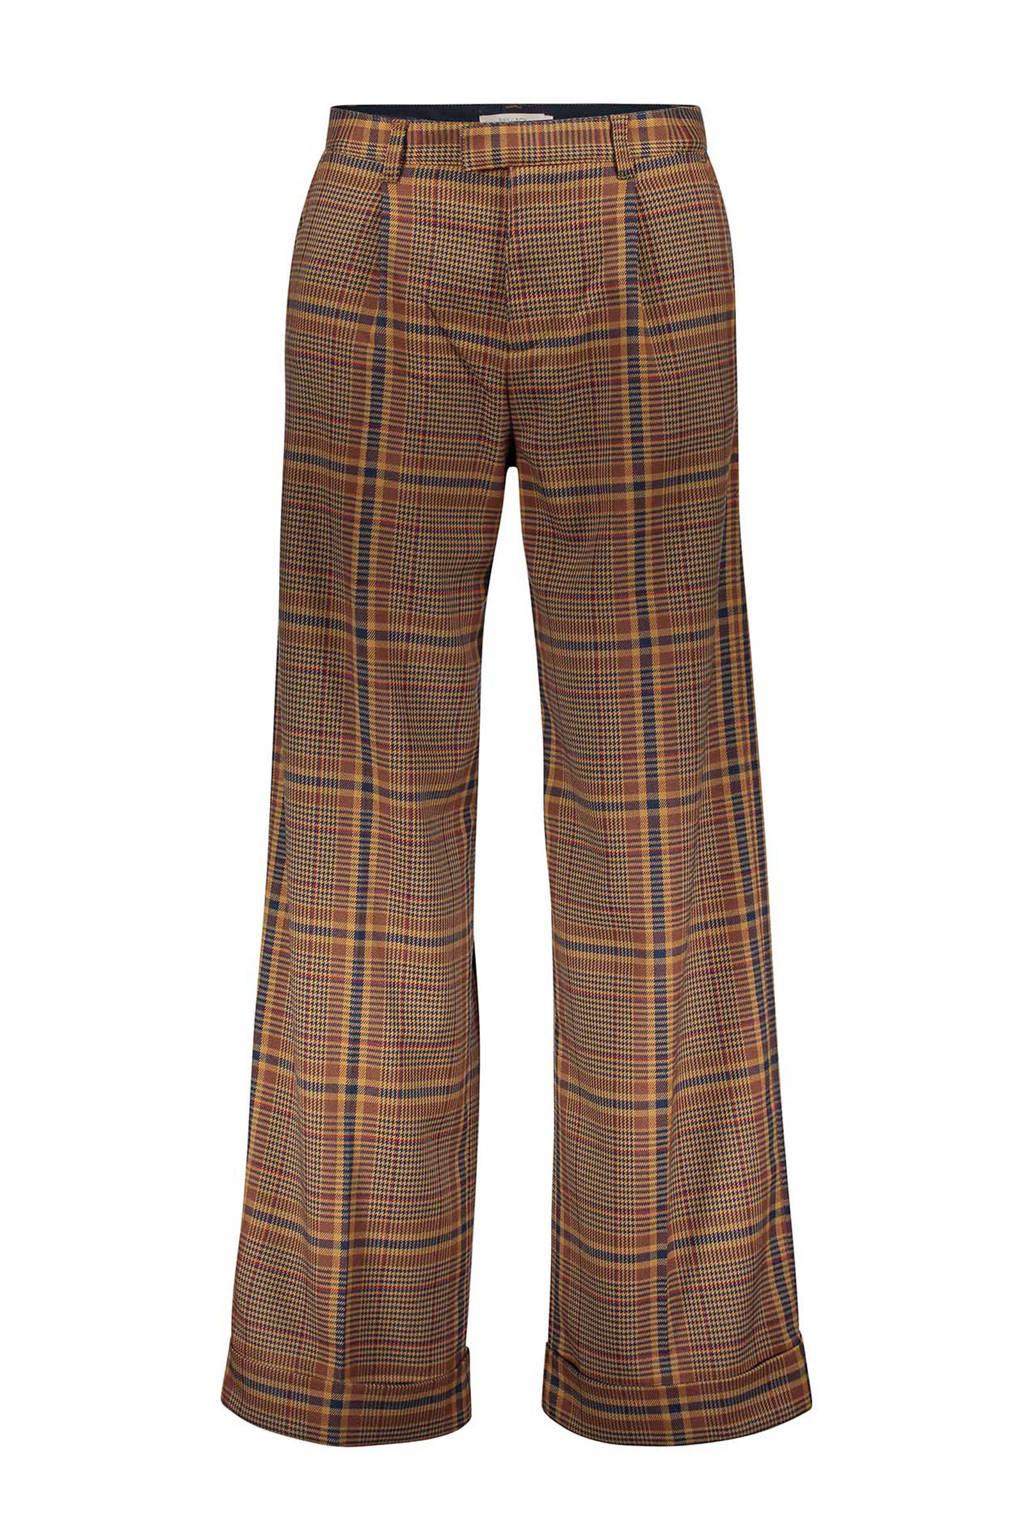 Sissy-Boy geruite pantalon bruin, Bruin